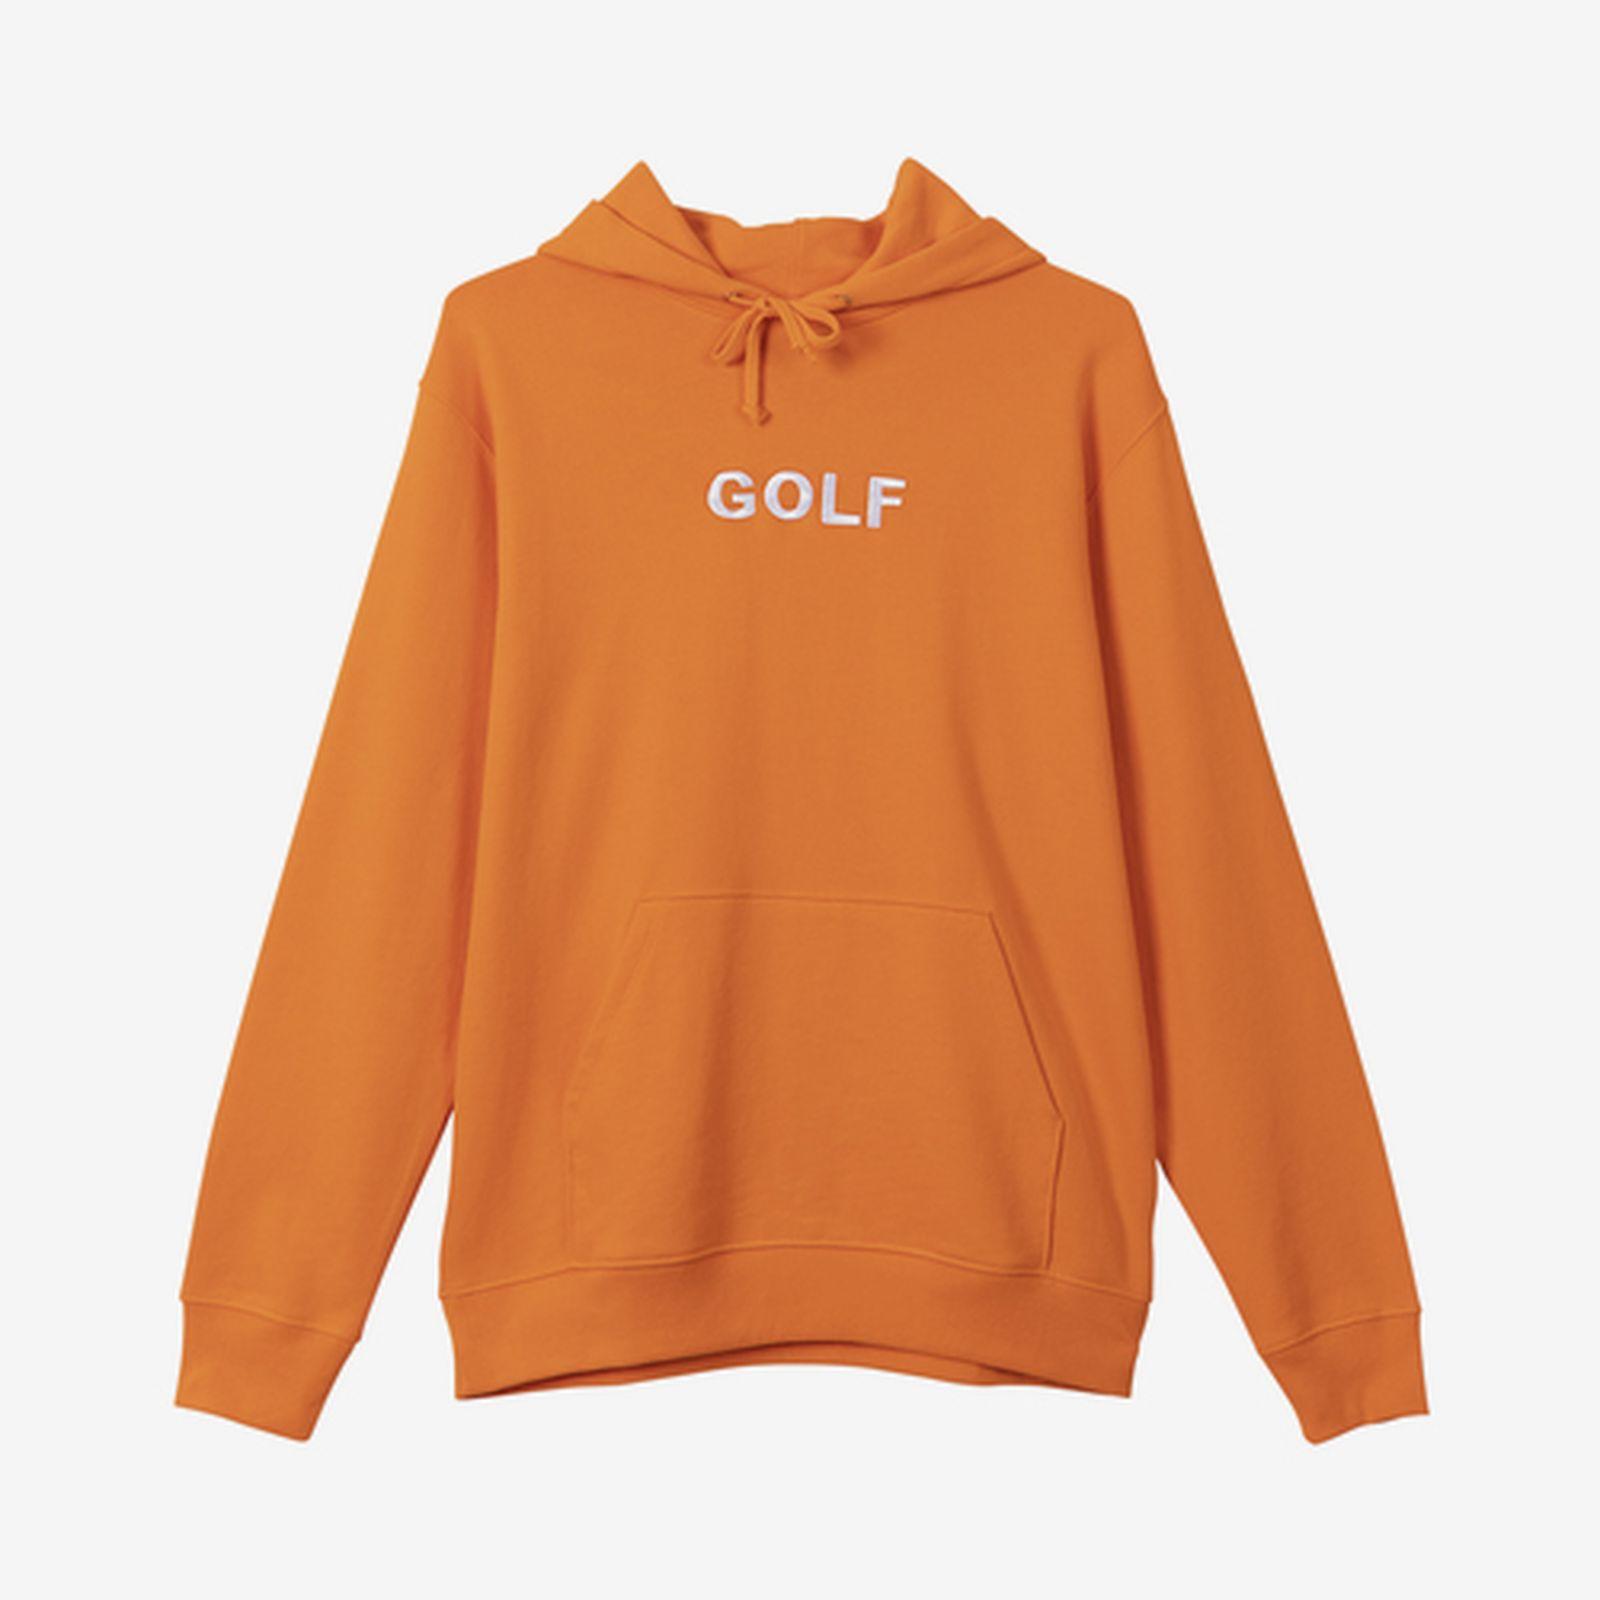 golf wang fw18 tyler the creator